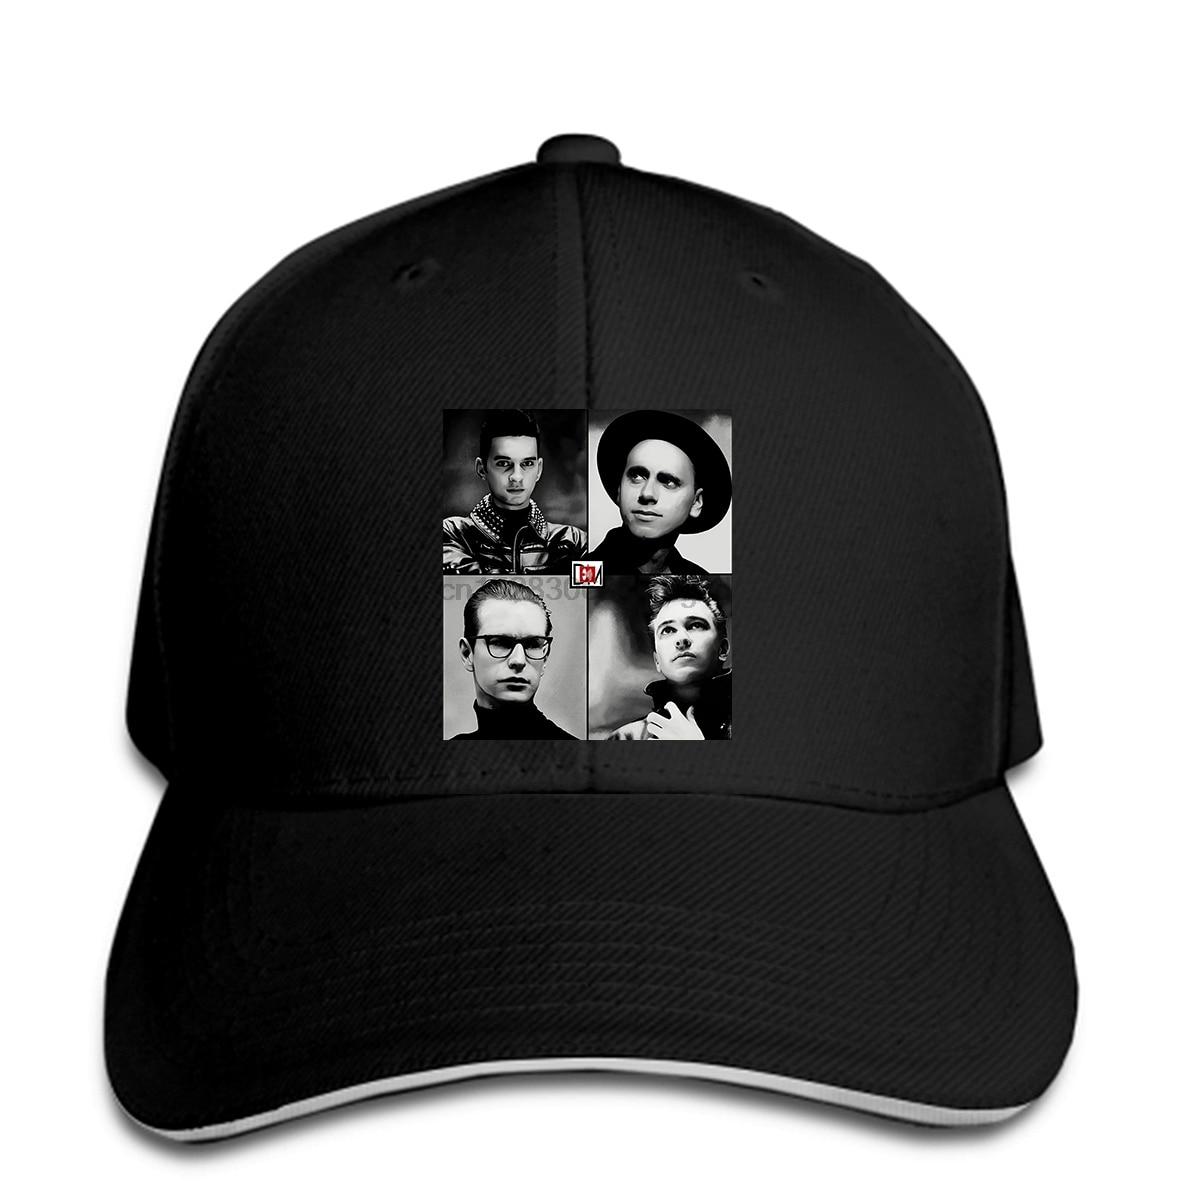 Vtg-1988-Depeche-Mode-USA-Tour-Men Baseball Cap-Concert-RARE-Vintage-Cool-Body Snapback Cap Women Hat Peaked